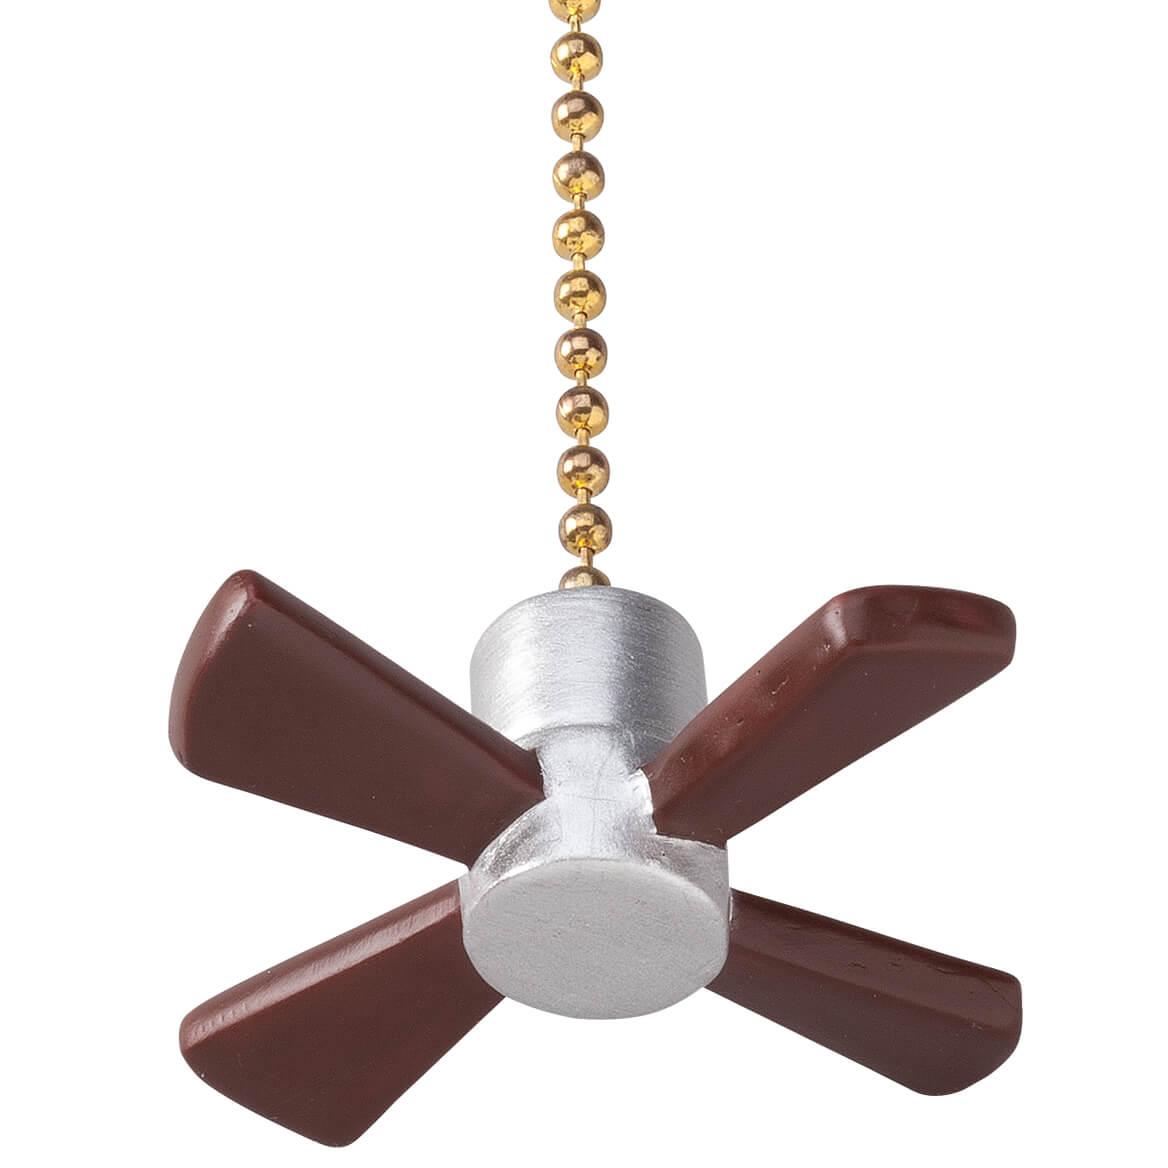 fan light pulls light pull pull switch miles kimball. Black Bedroom Furniture Sets. Home Design Ideas